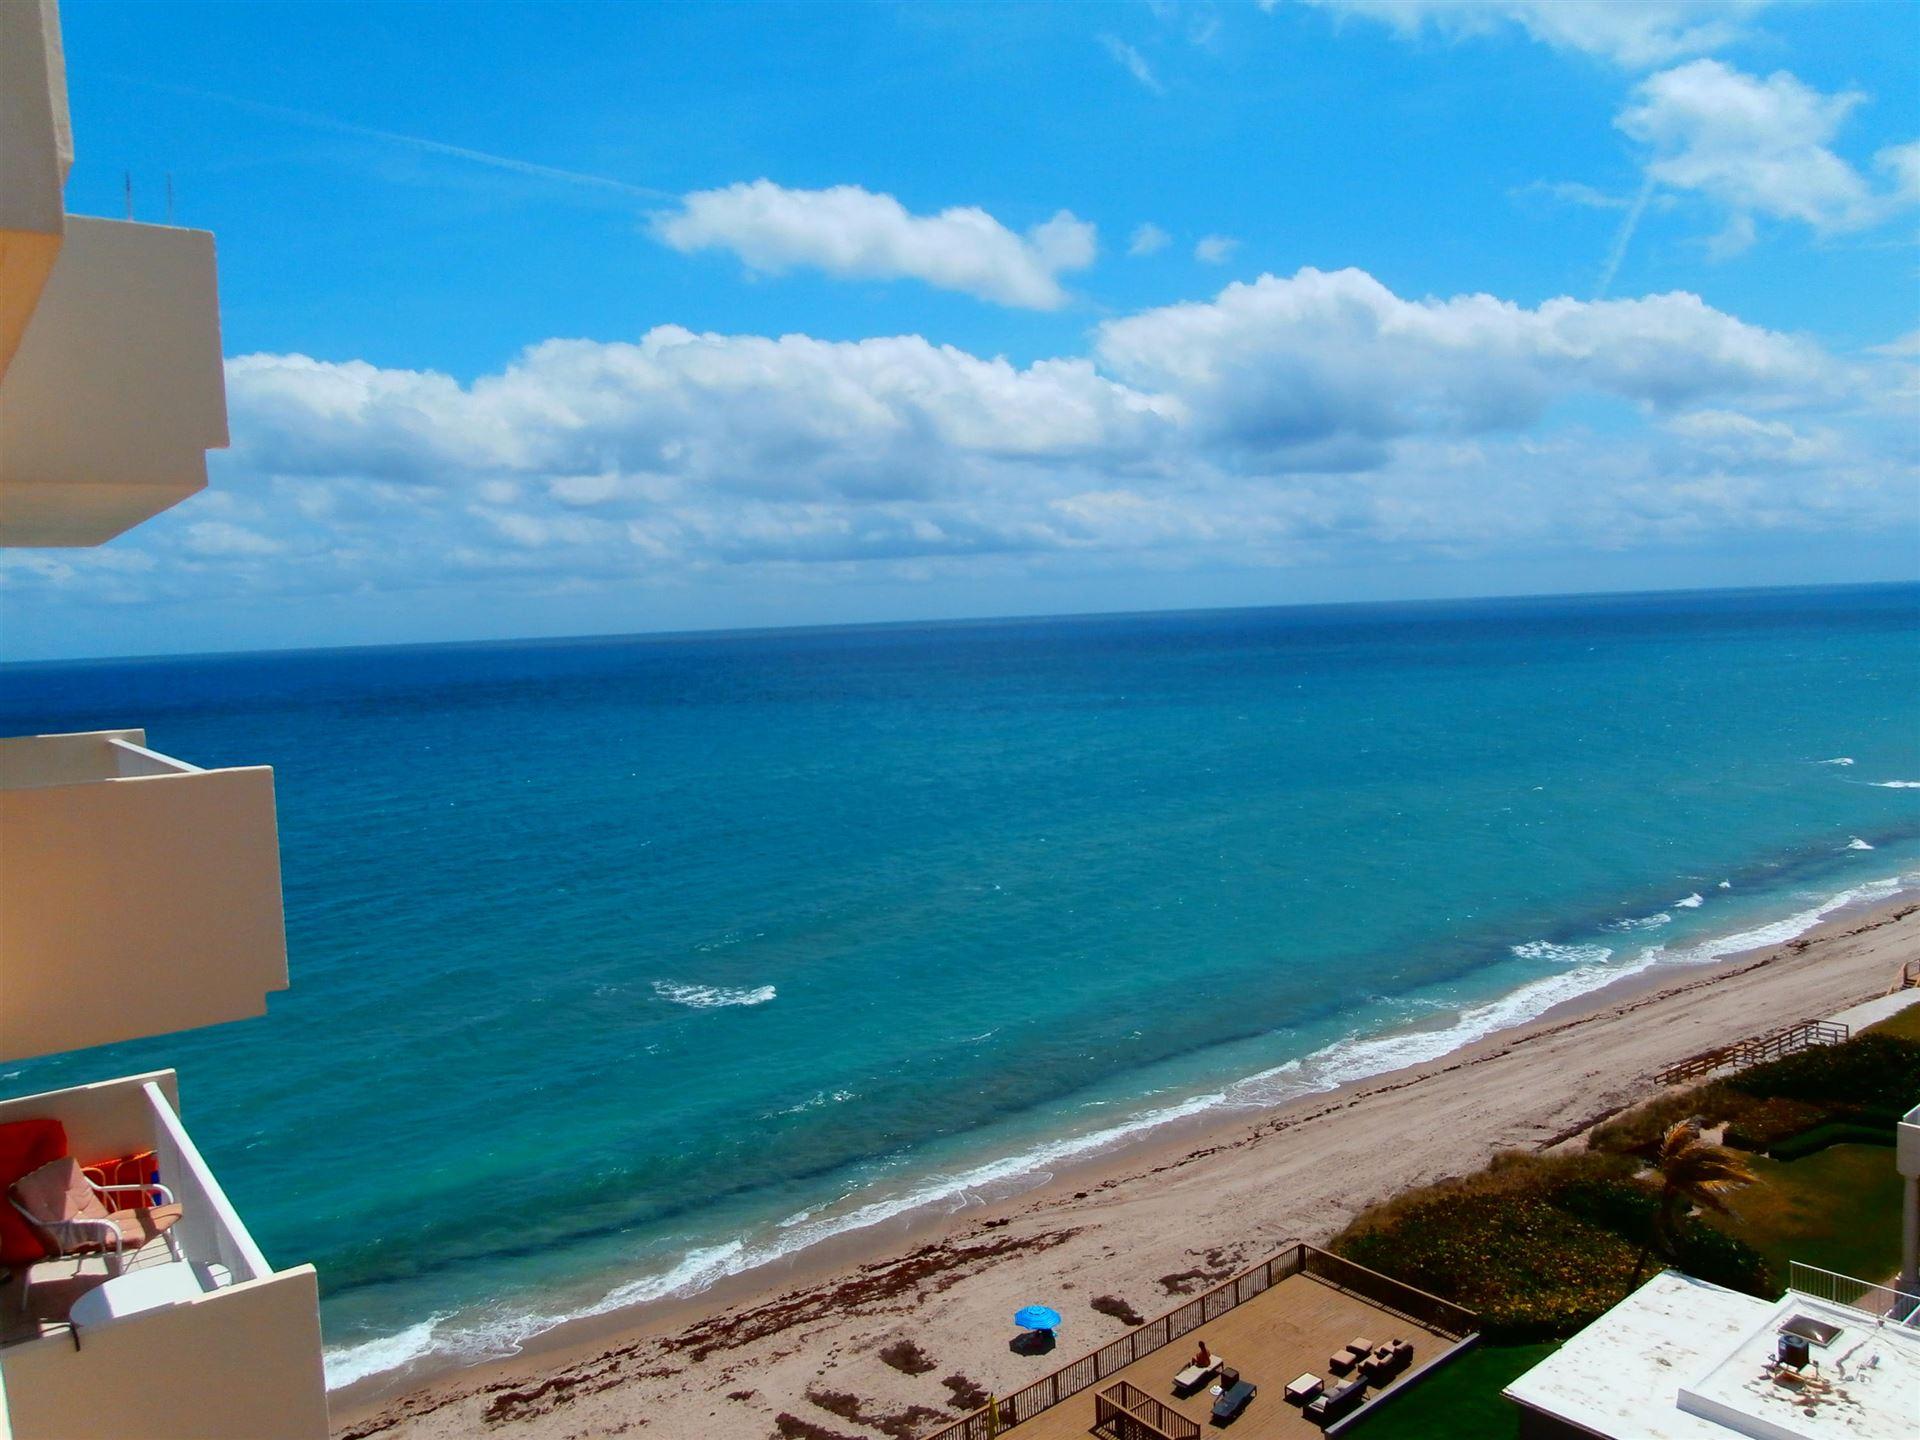 4511 S Ocean Boulevard #1003 Penthse, Highland Beach, FL 33487 - #: RX-10638691